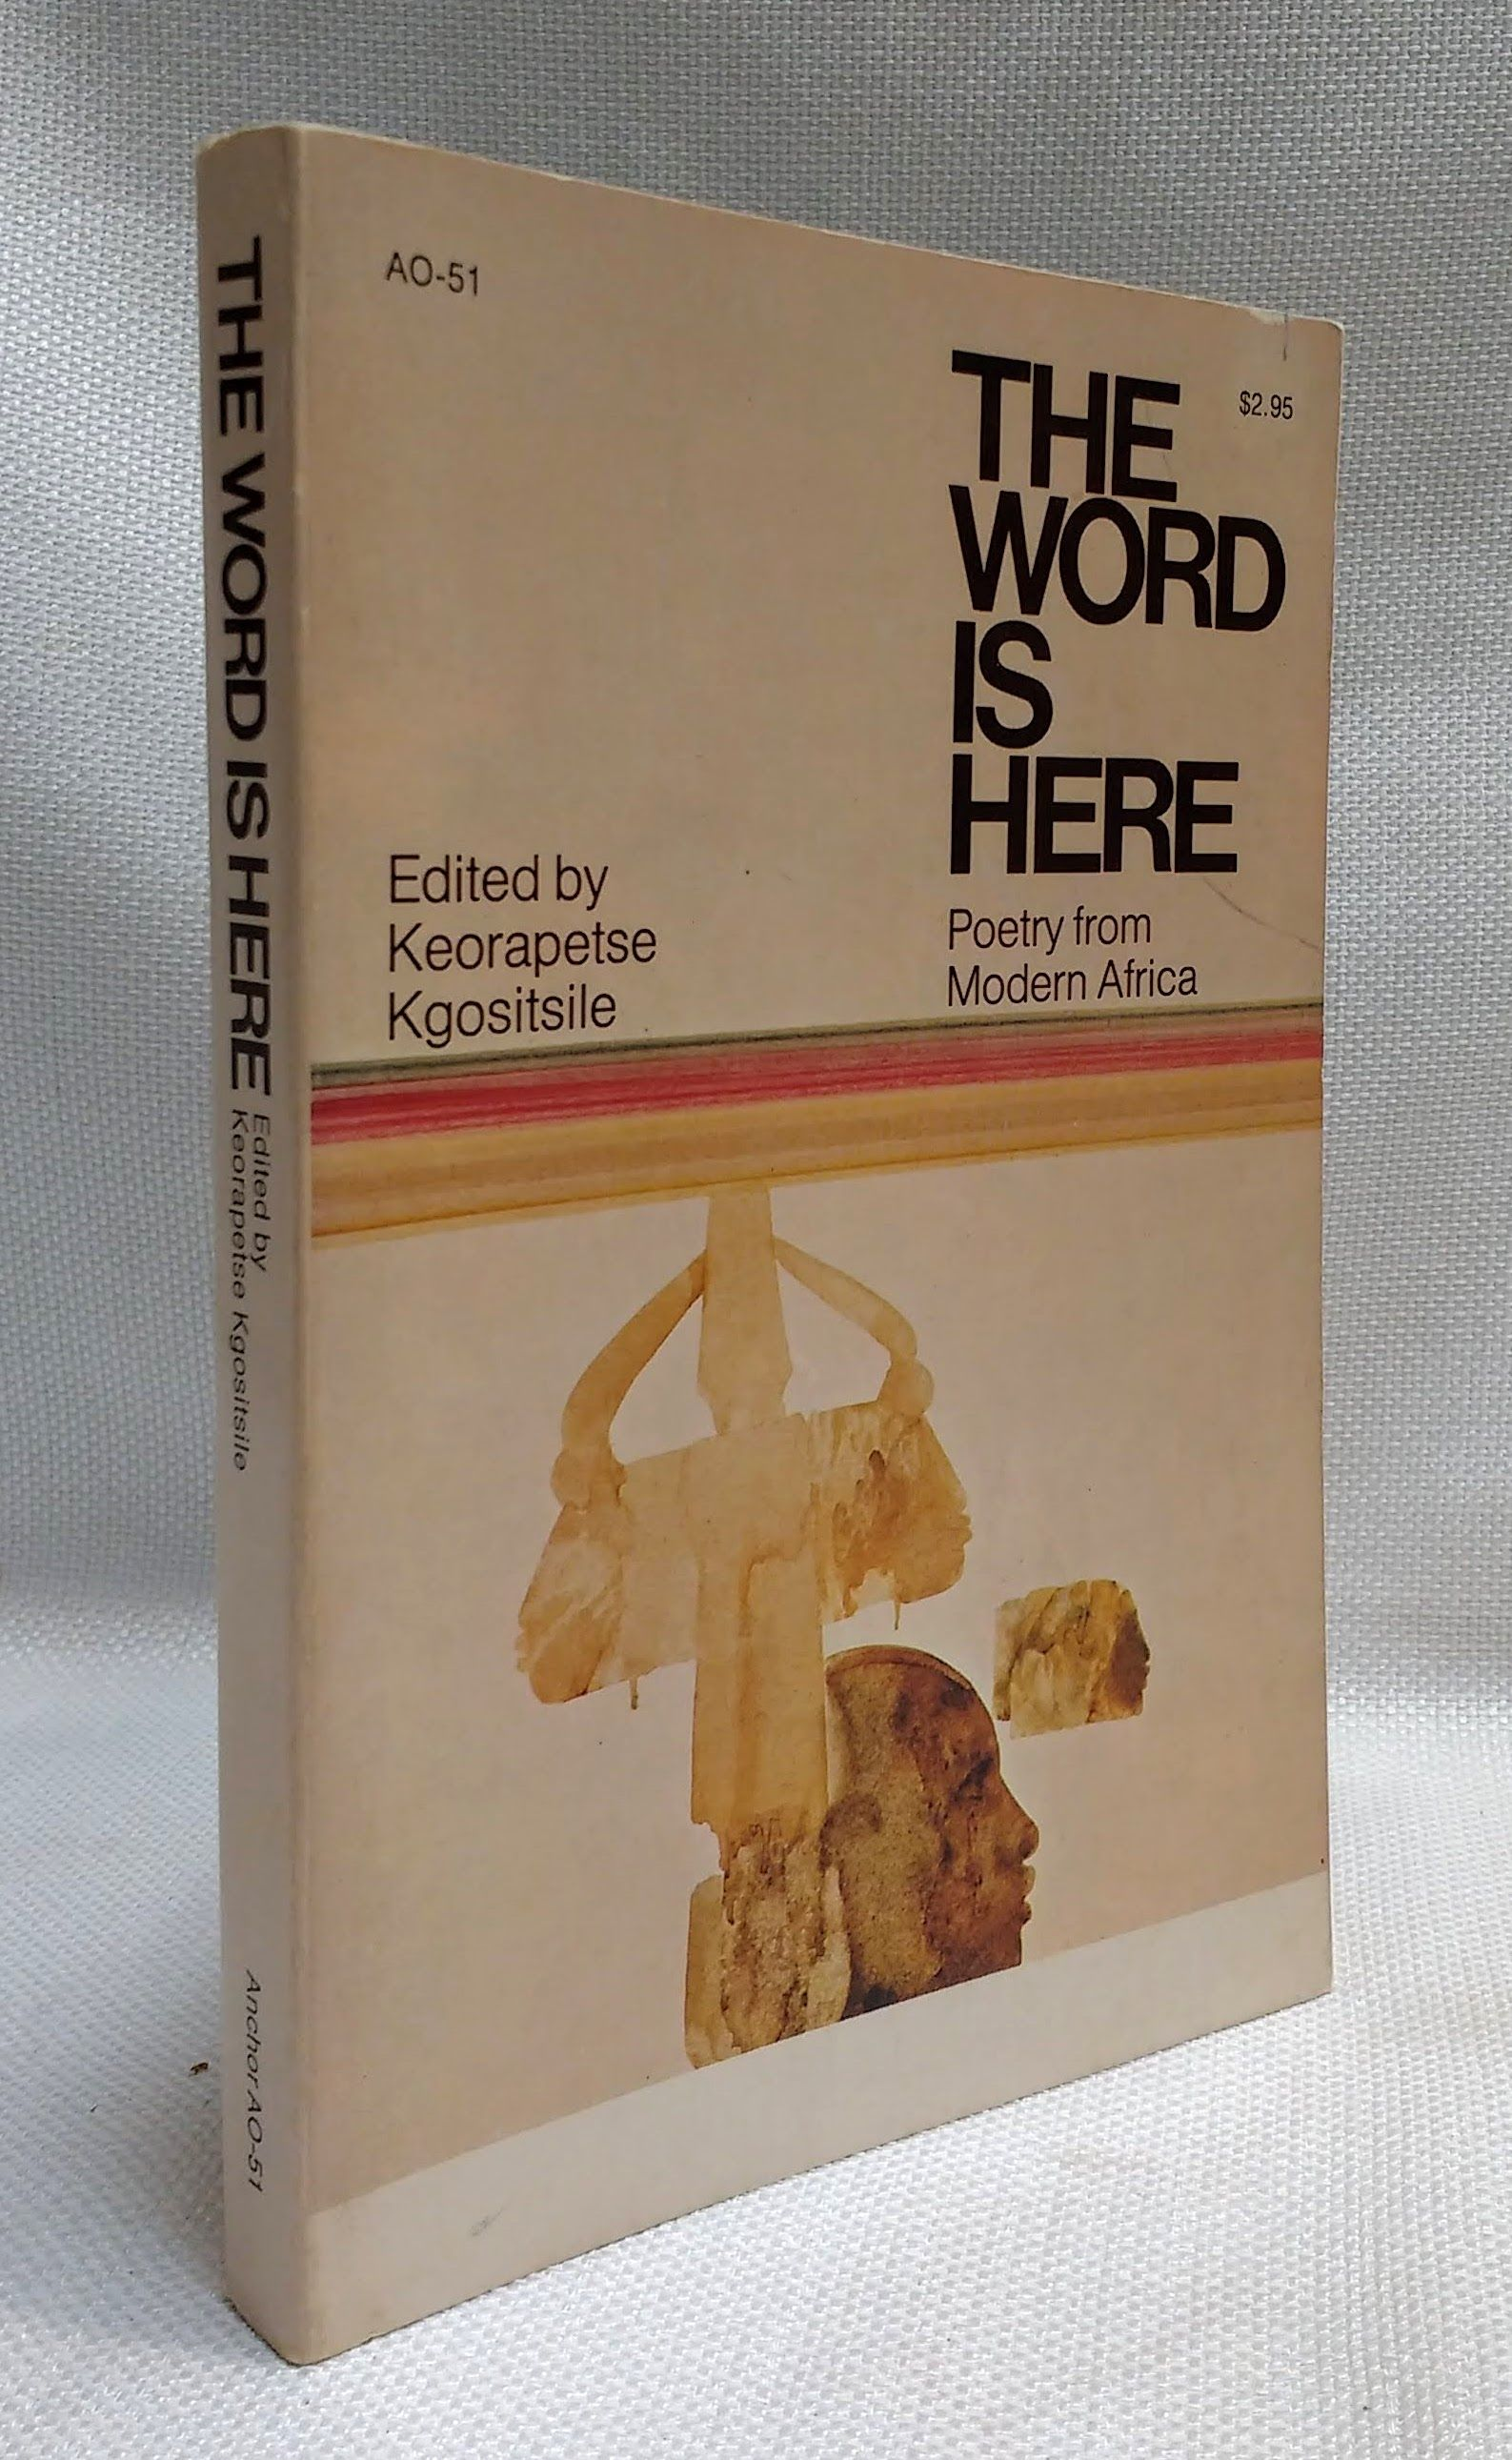 The word is here: Poetry from modern Africa, Kgositsile, Keorapetse [ed.]